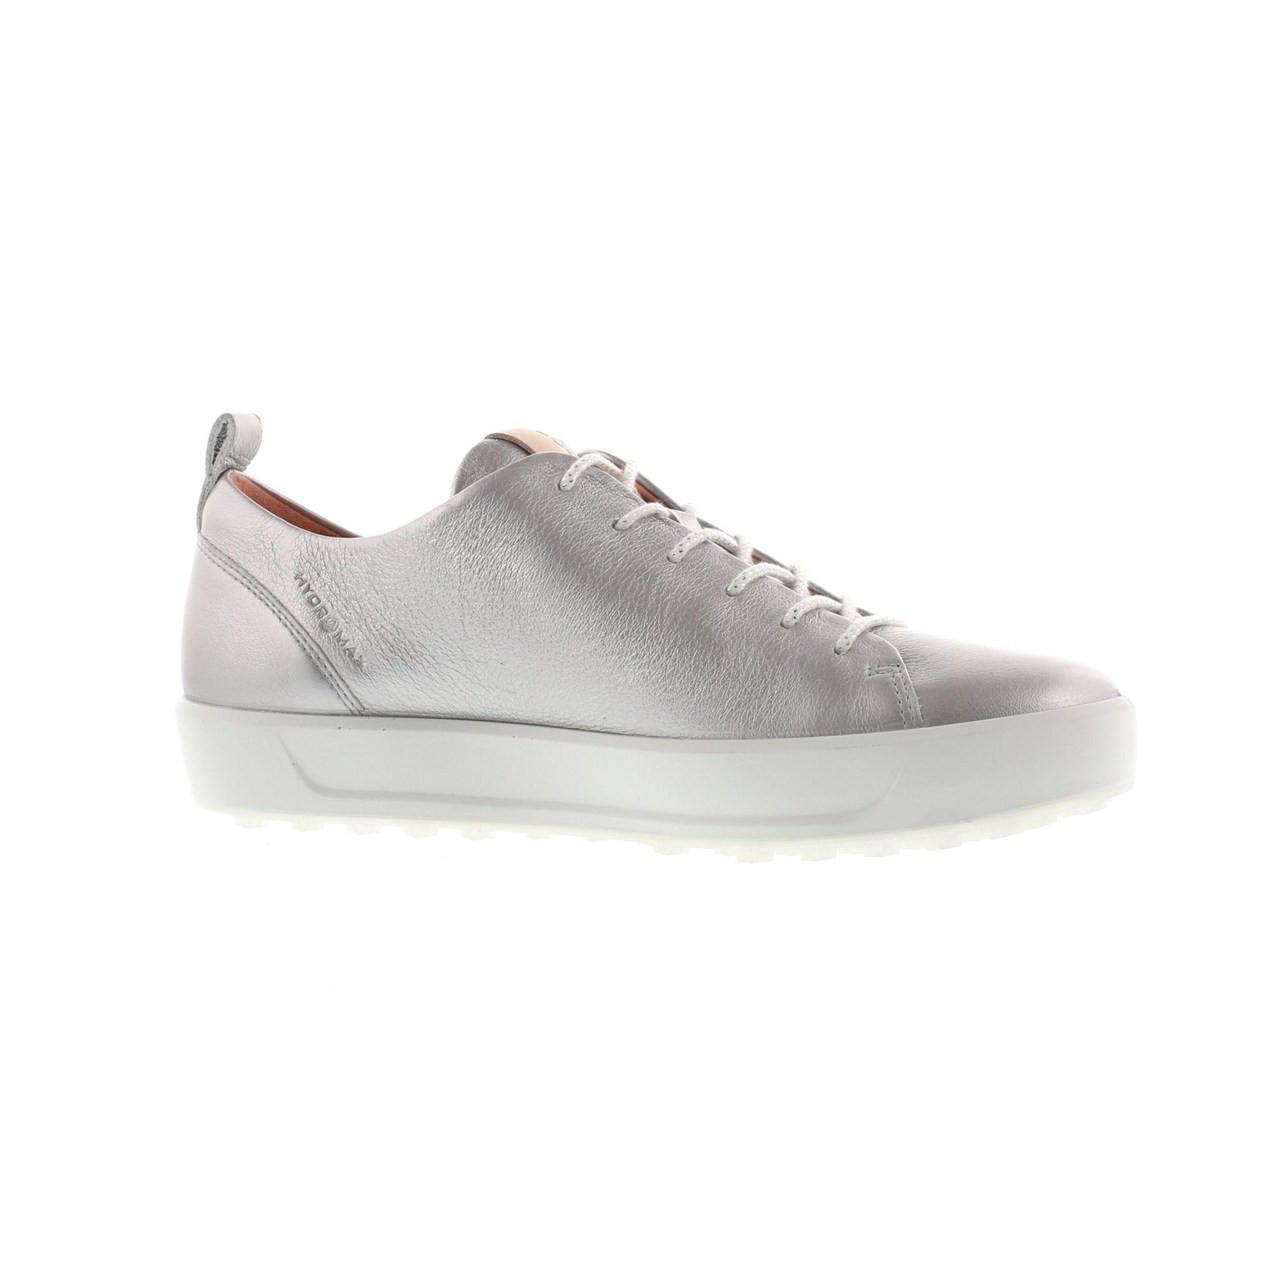 bfa4bc949c225 Ecco Women's Golf Soft Shoes Alu Silver - Extra width Option ...